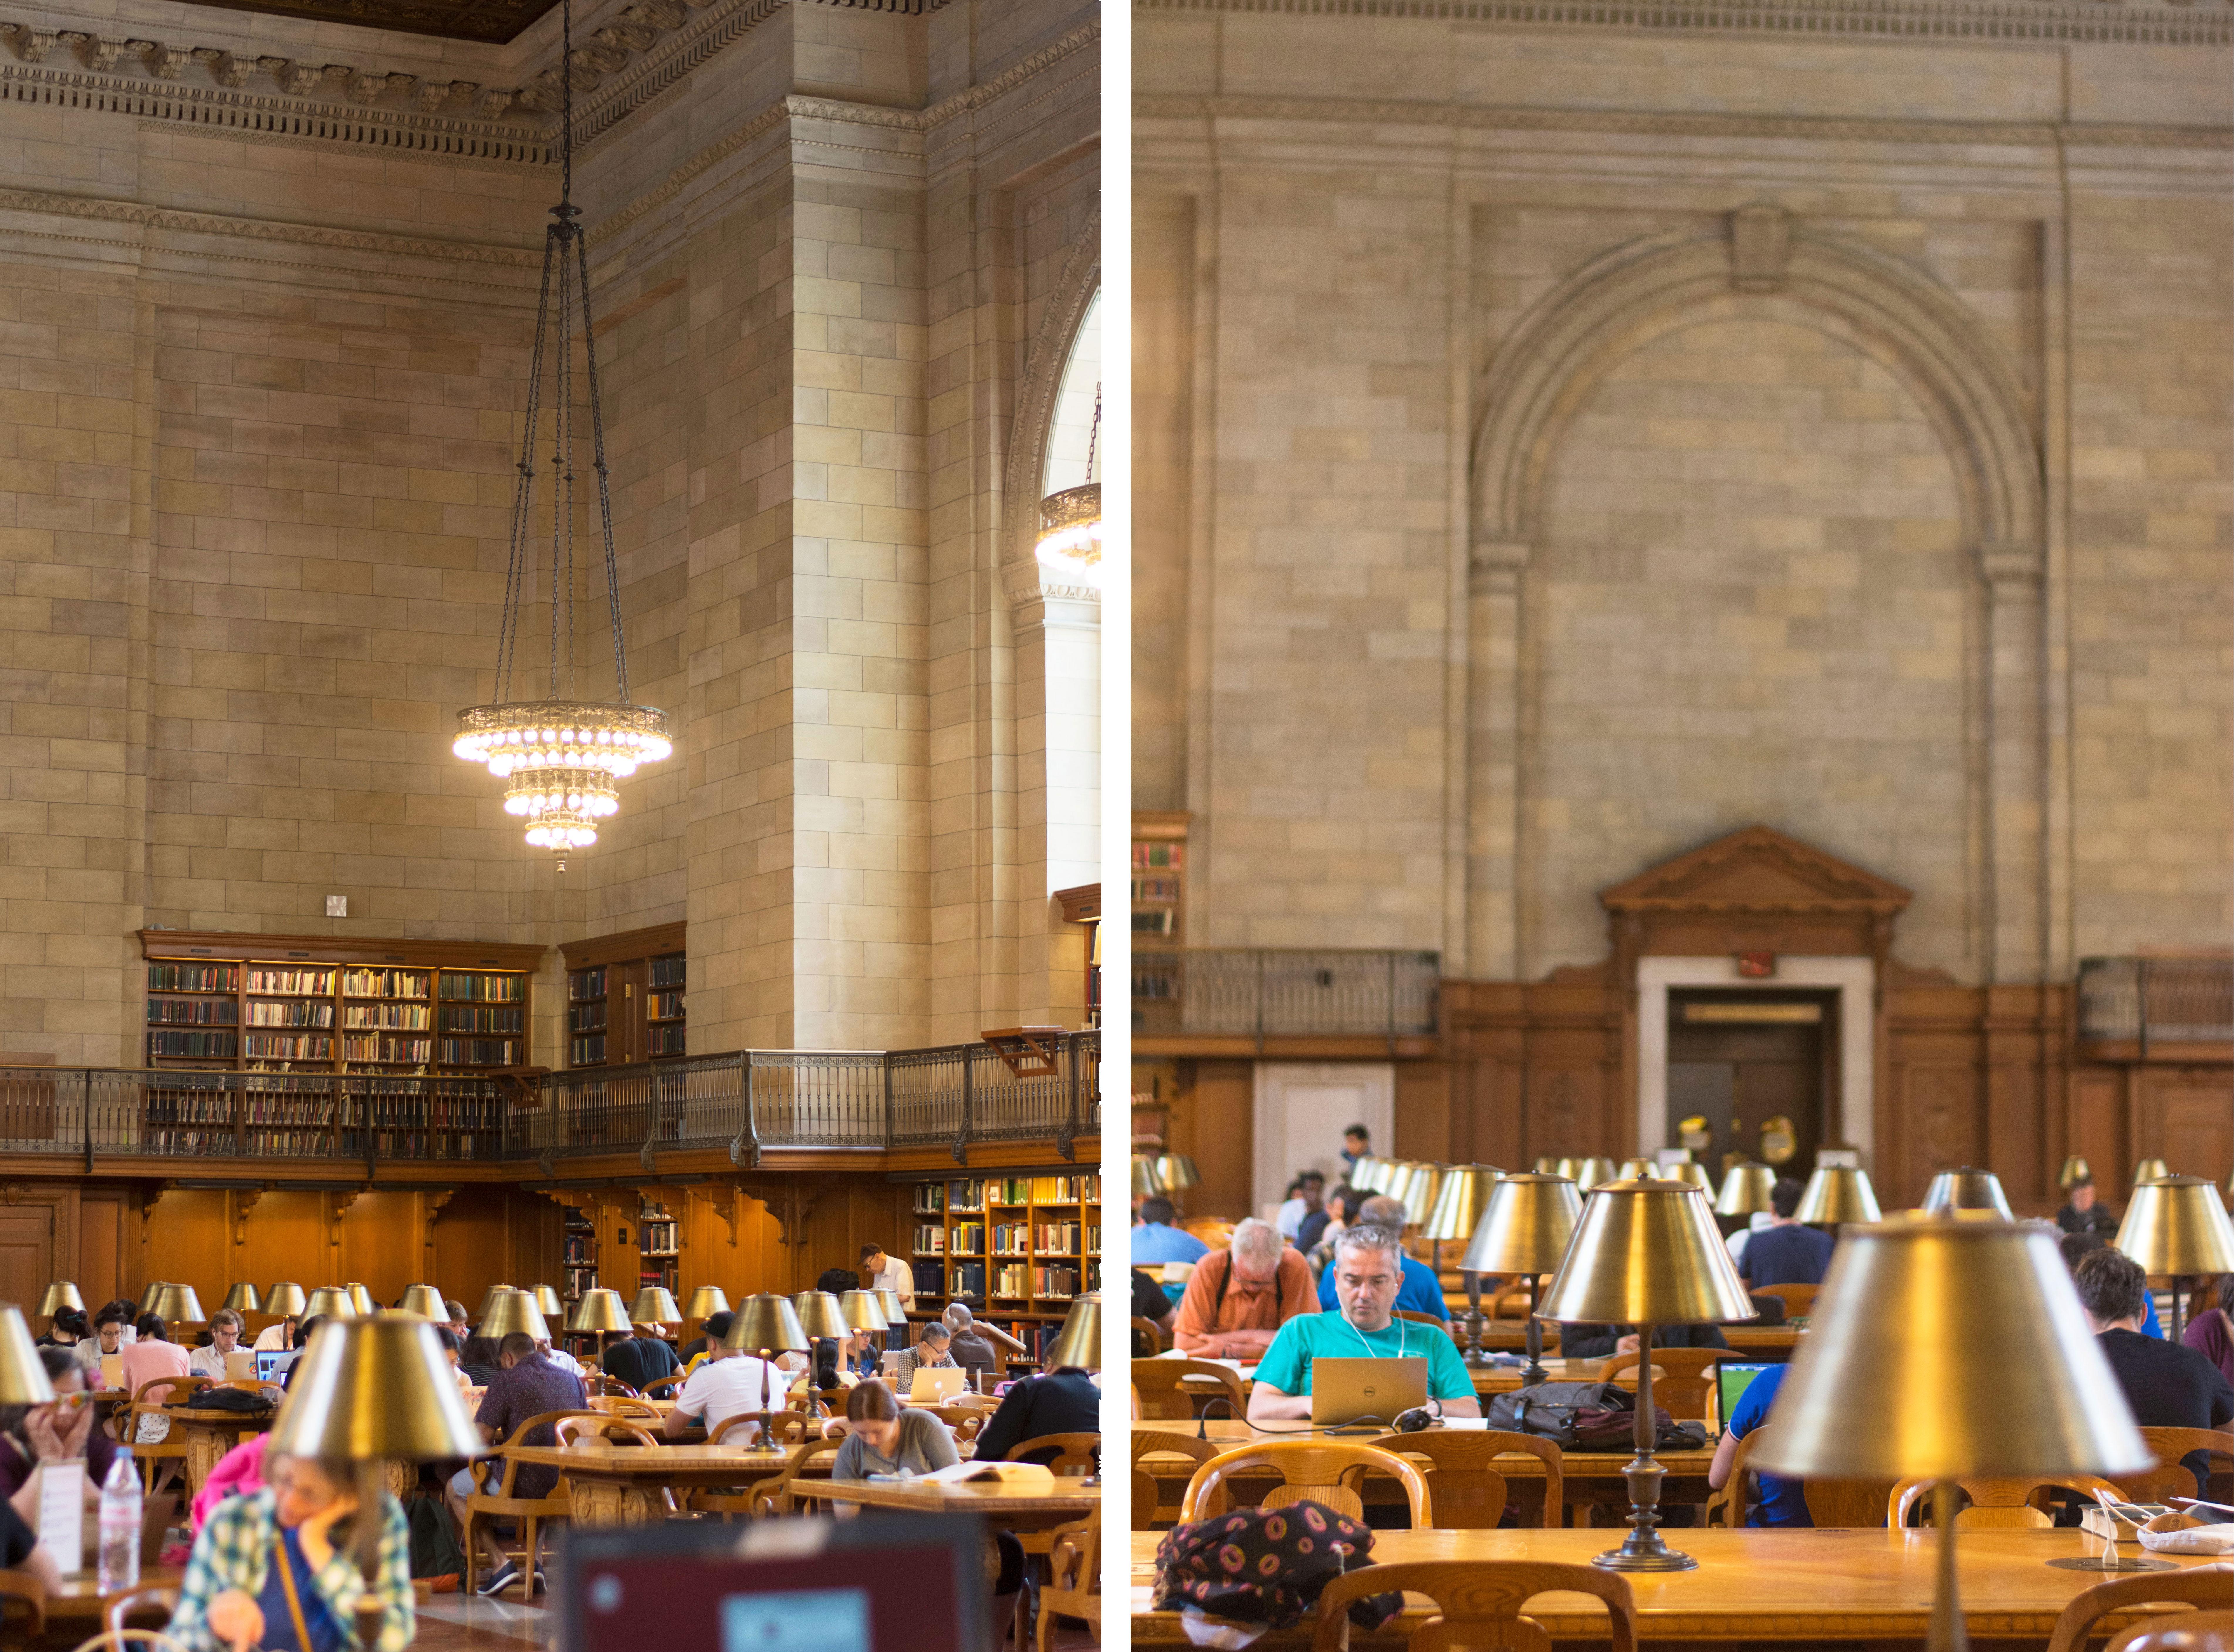 New York City Public Library